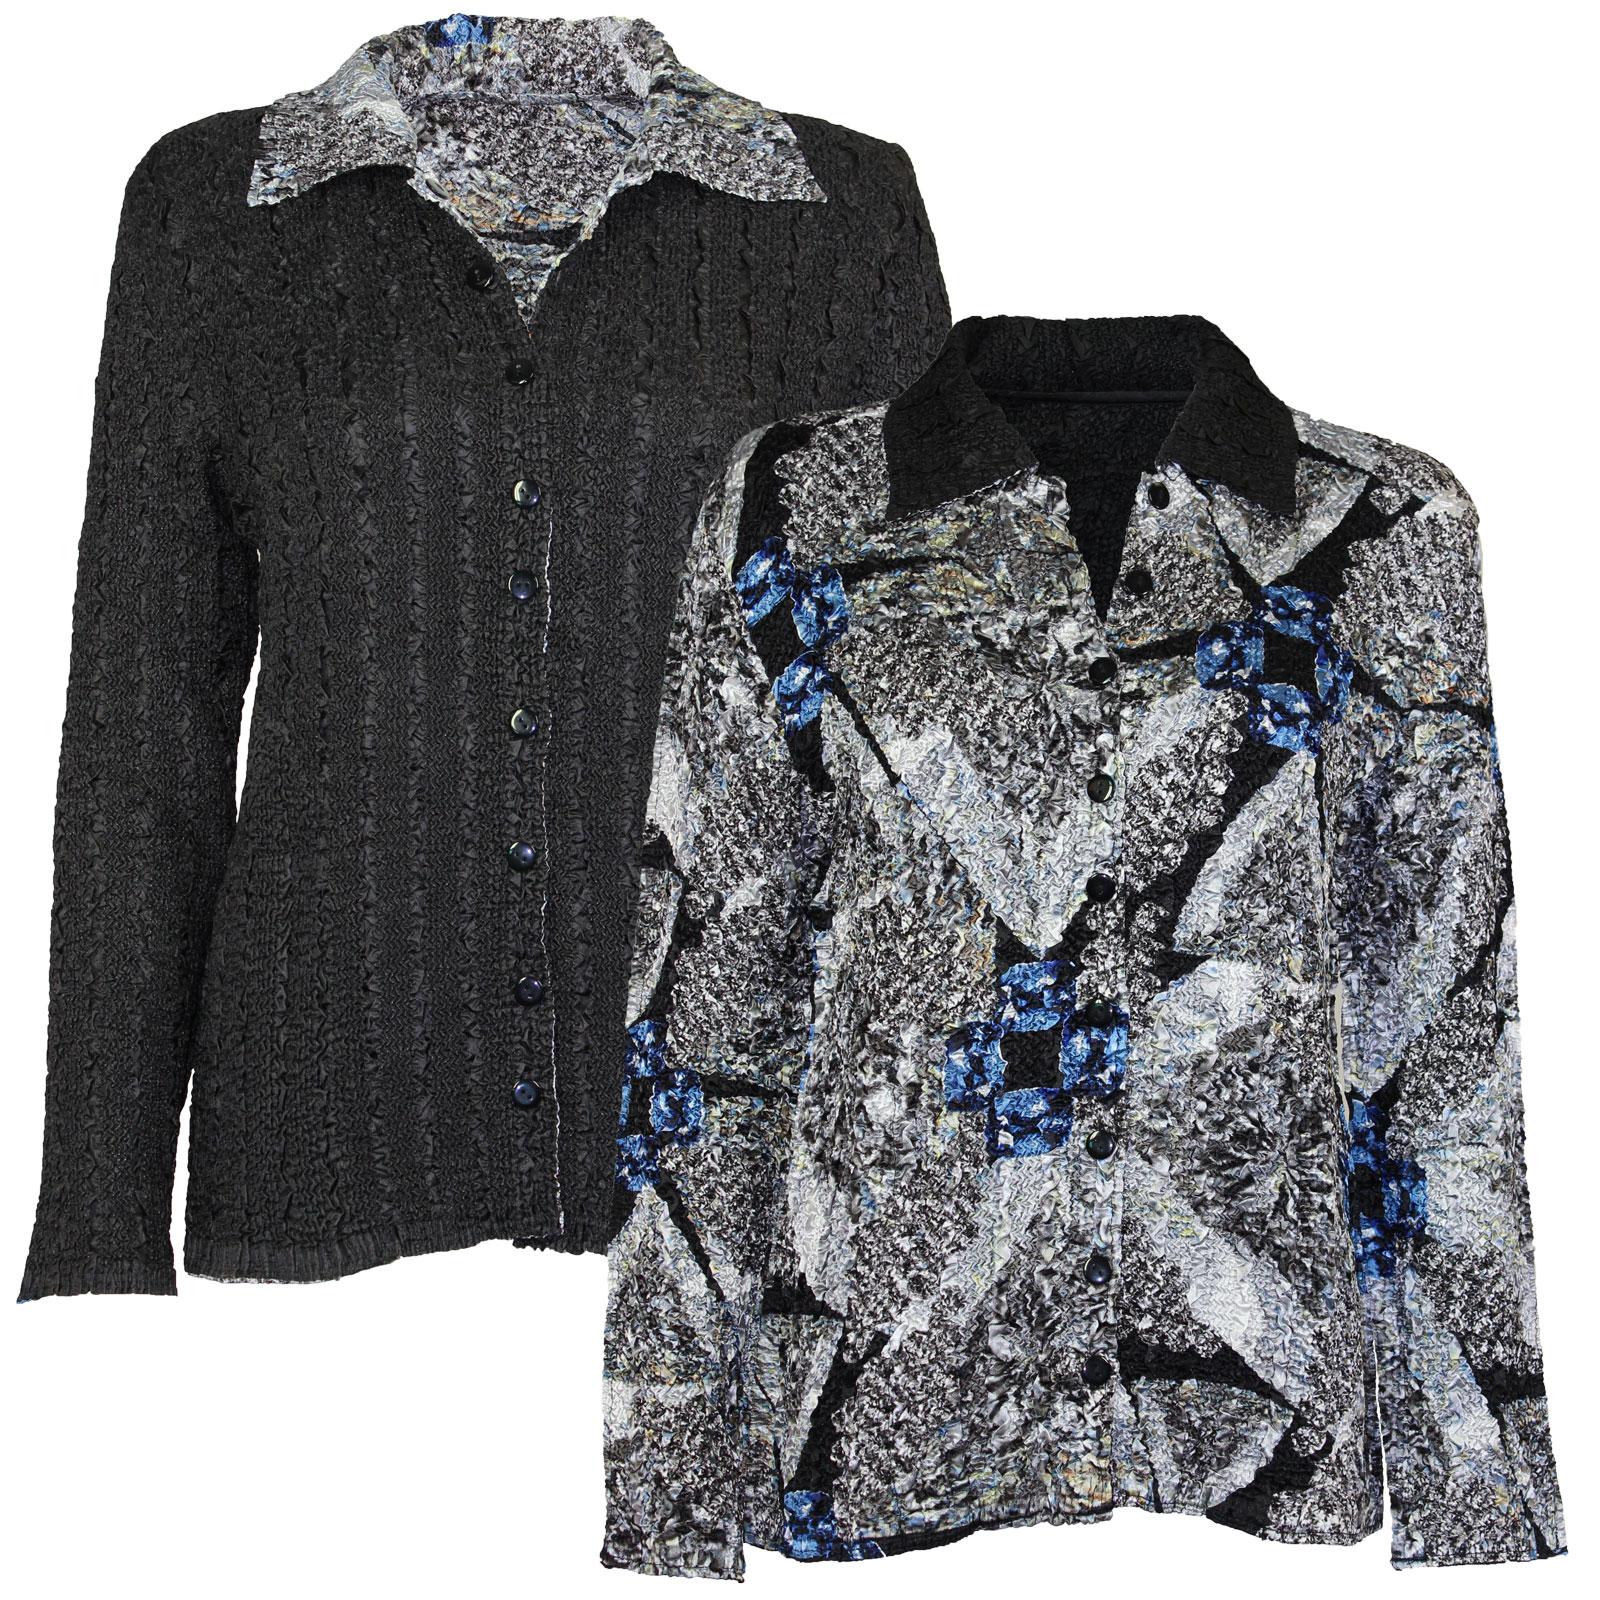 Wholesale Magic Crush - Reversible Jackets #14012 Black, Grey and Blue Print - S-M